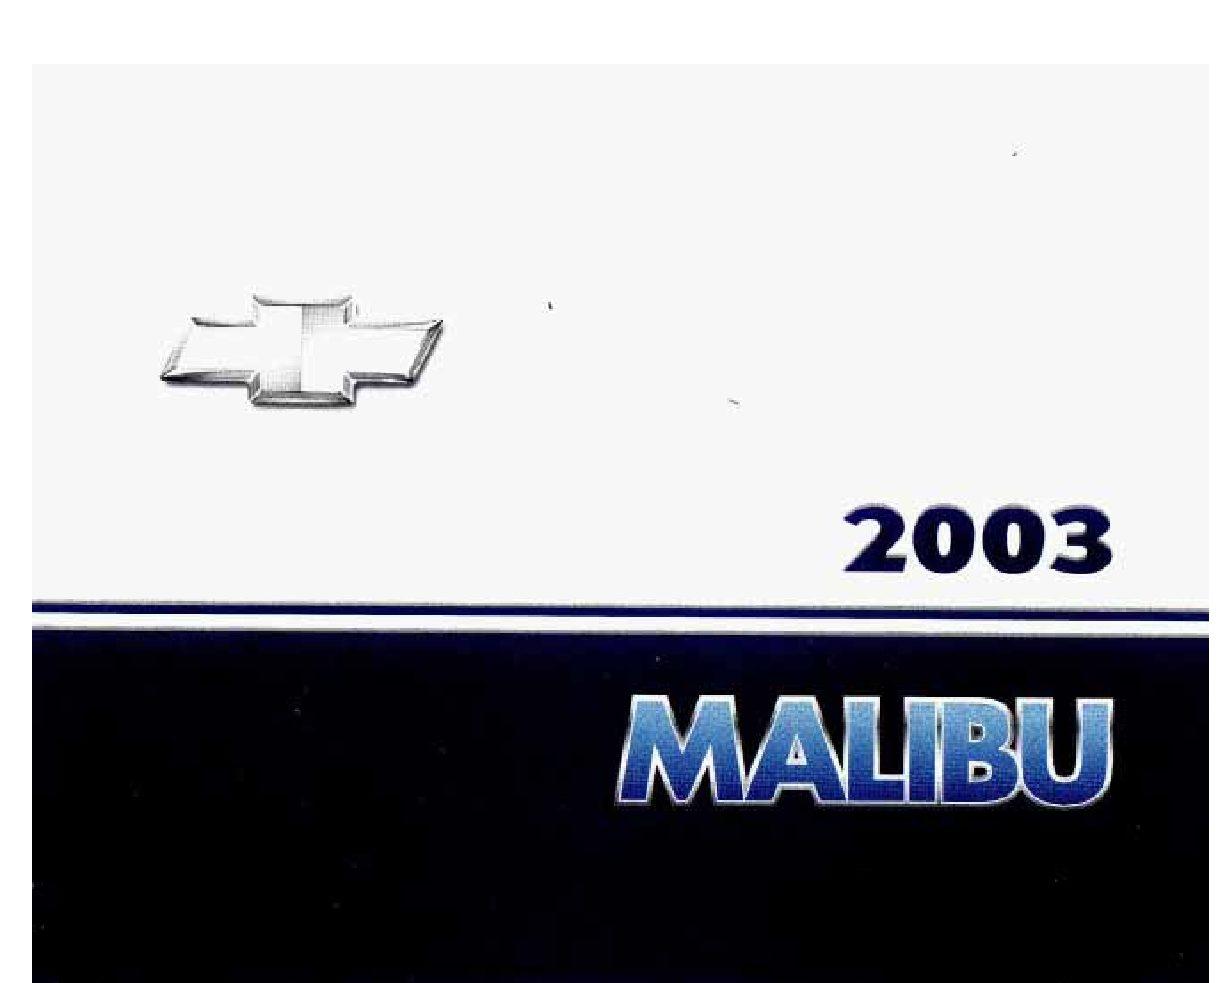 2003 chevrolet malibu owners manual just give me the damn manual rh justgivemethedamnmanual com 2003 chevrolet malibu owners manual pdf 2004 chevrolet malibu owners manual